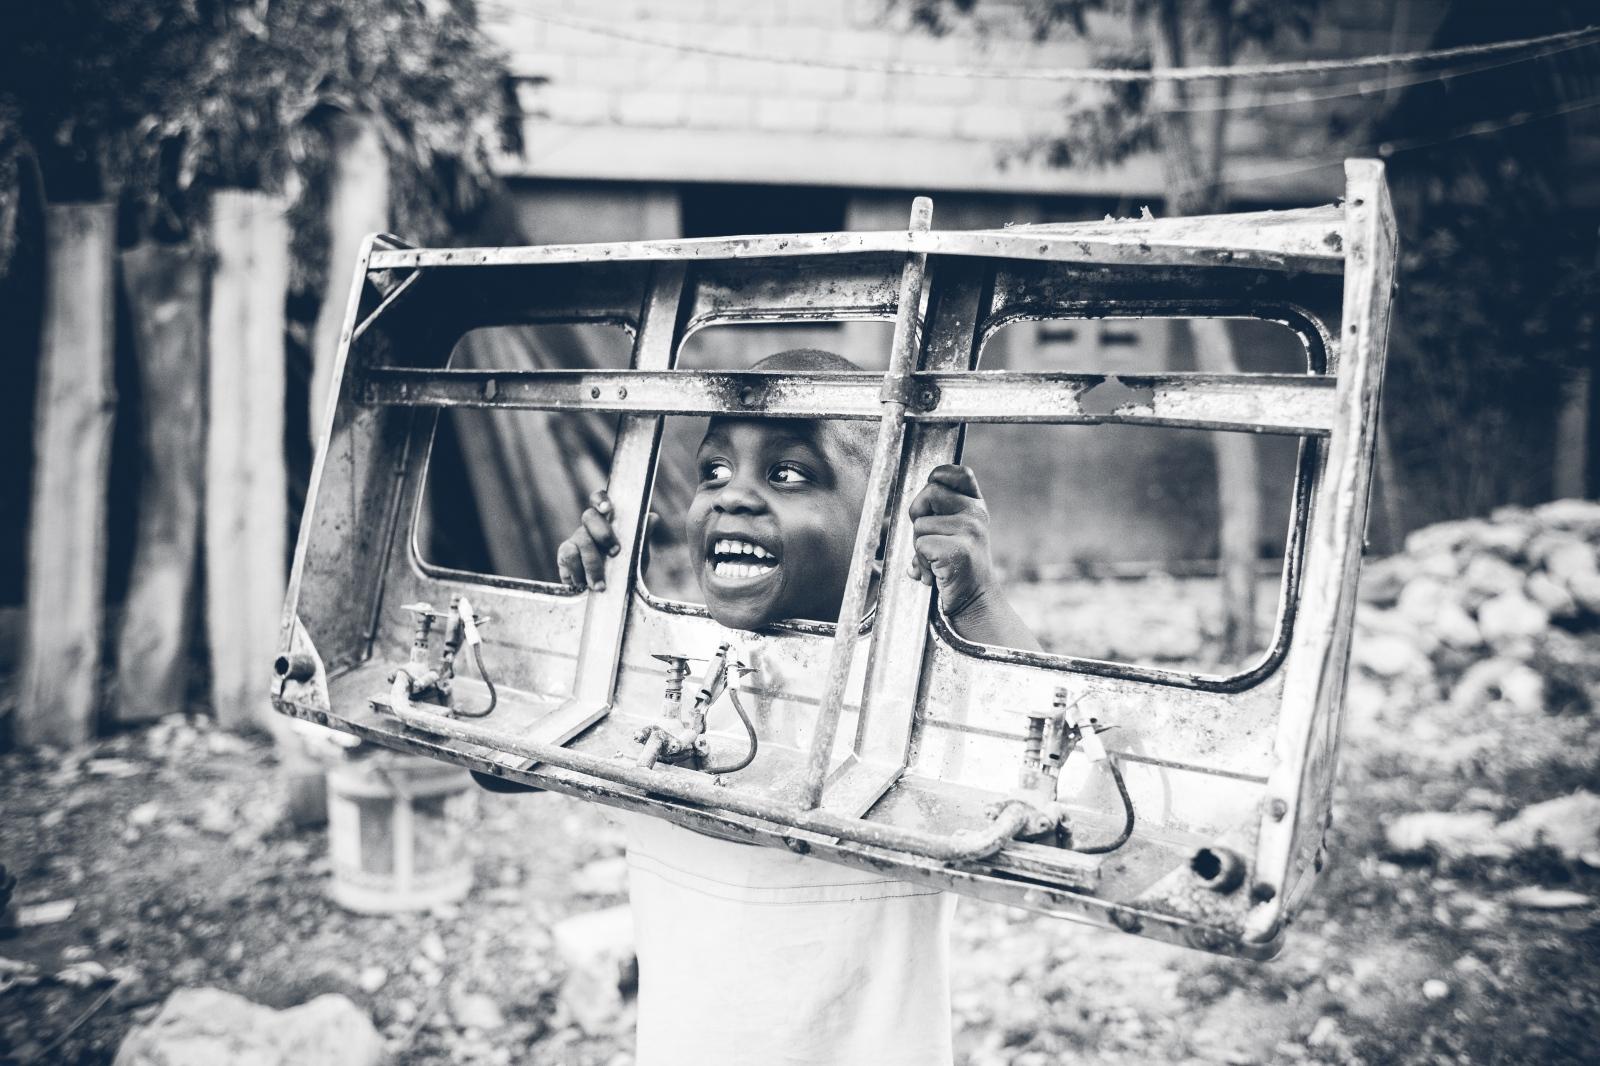 Art and Documentary Photography - Loading journ__e_des_droits_de_l_enfant-6.jpg